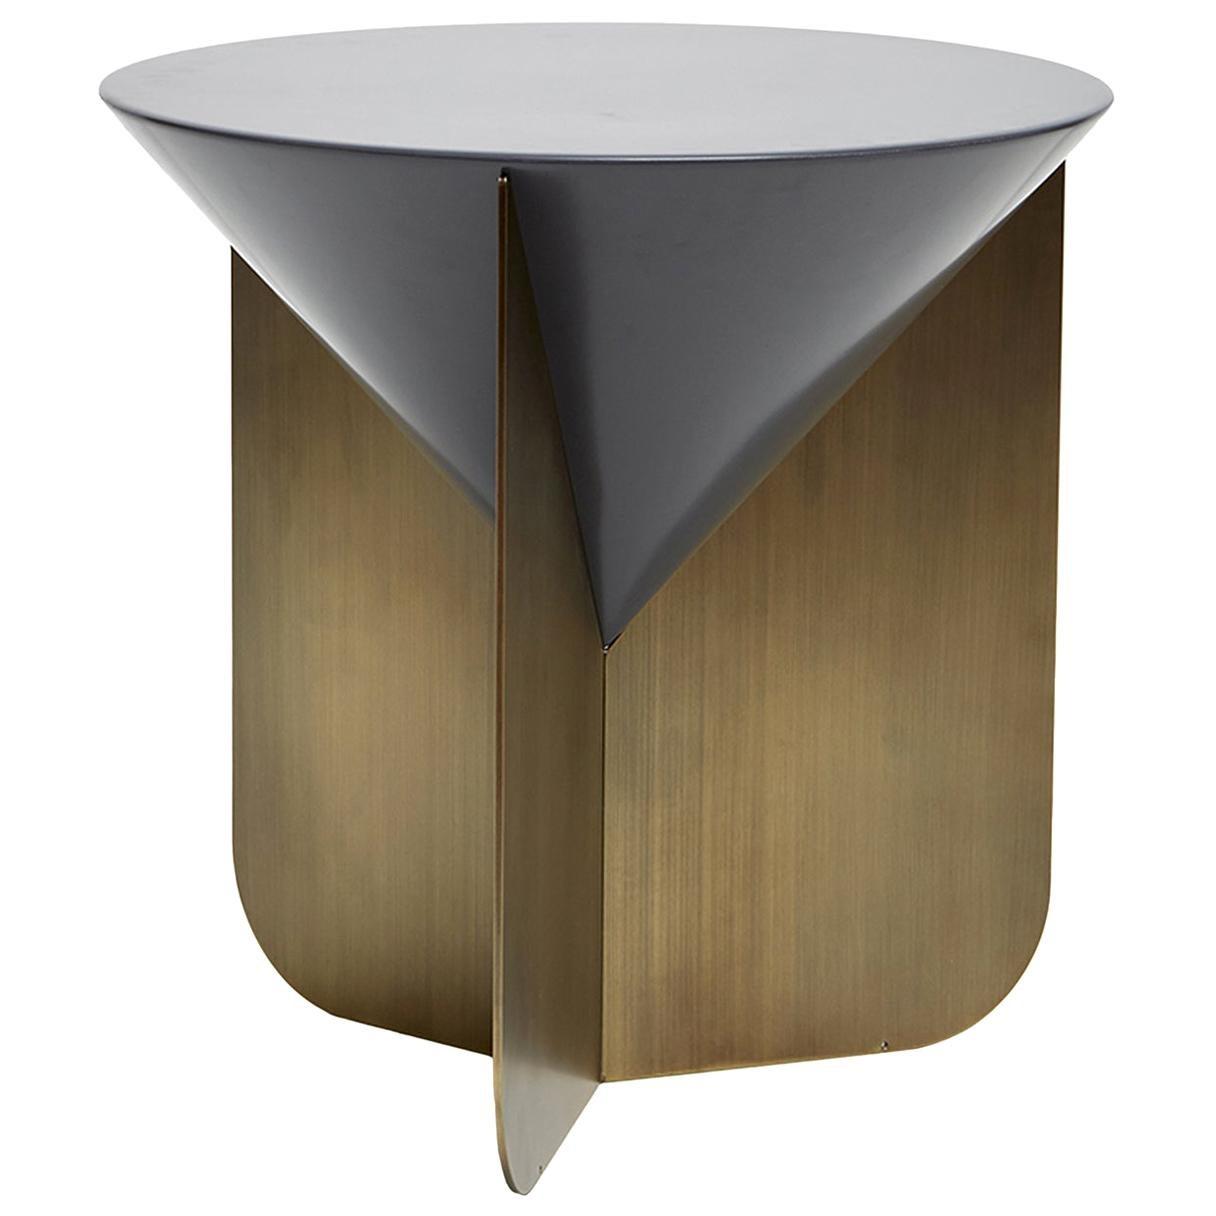 Cone Blue and Gray Side Table by Matteo Zorzenoni